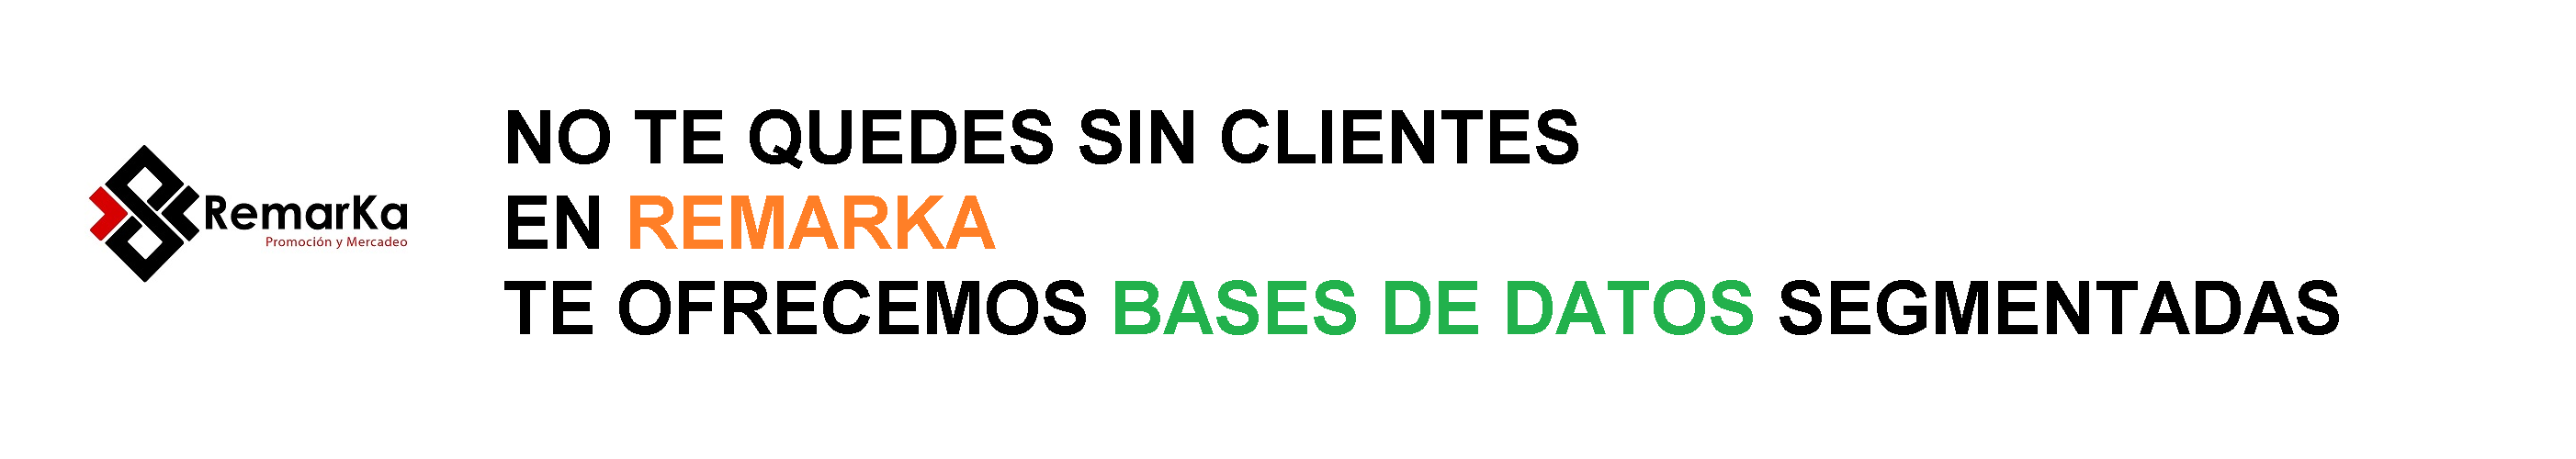 Promocion Bases de Datos